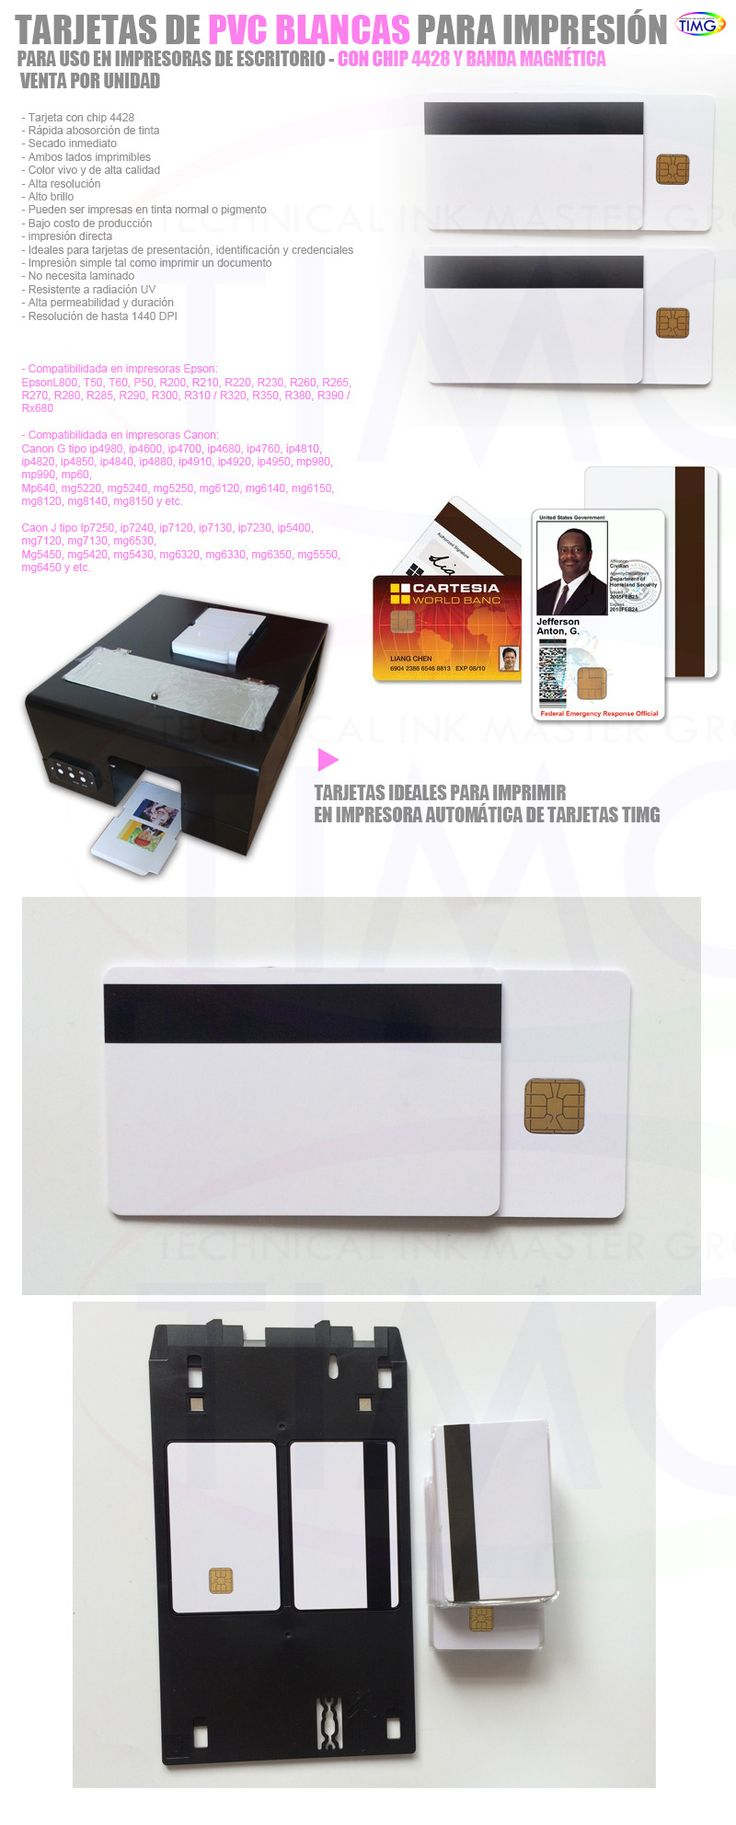 Tenemos nuevas tarjetas imprimibles de PVC con banda magnetica y Chip - http://www.suministro.cl/product_p/4003020004.htm#utm_sguid=166629,a4030b5c-1981-b171-6829-0d0cb123339c